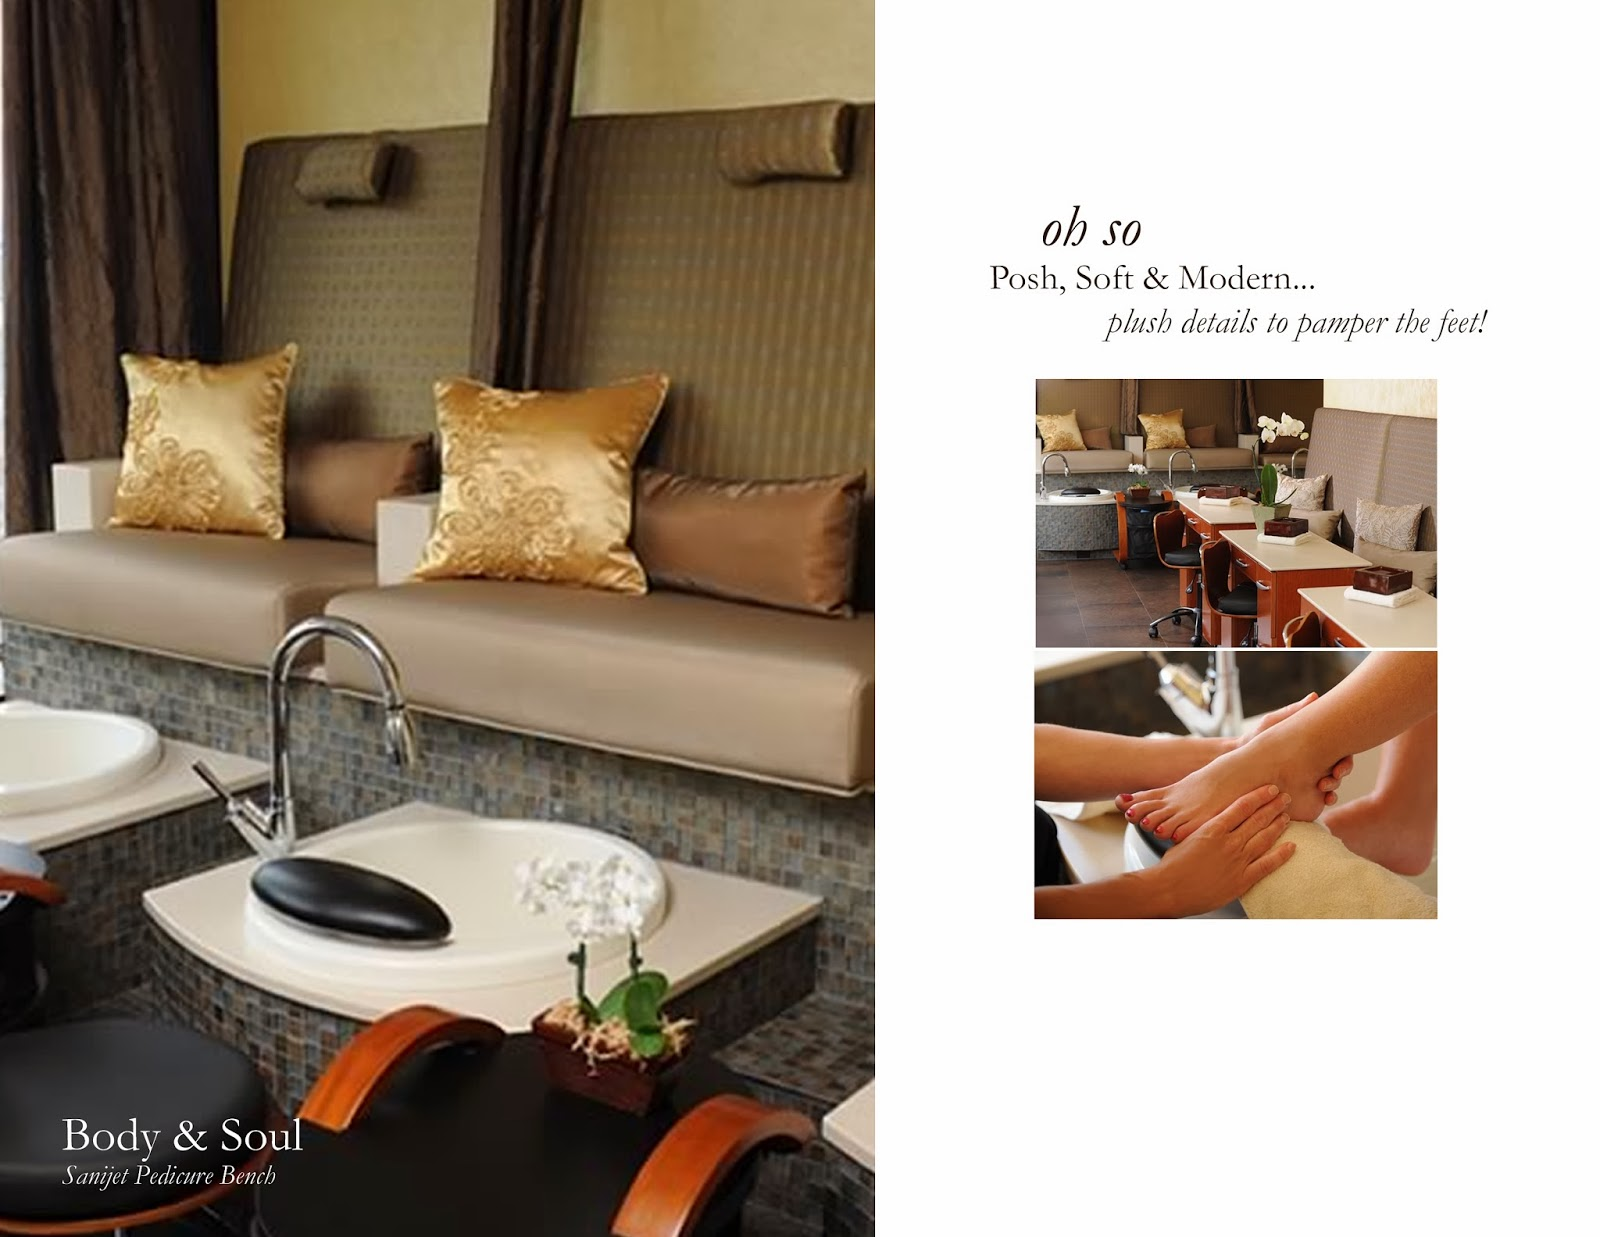 Michele pelafas december 2013 for Nail salon benches